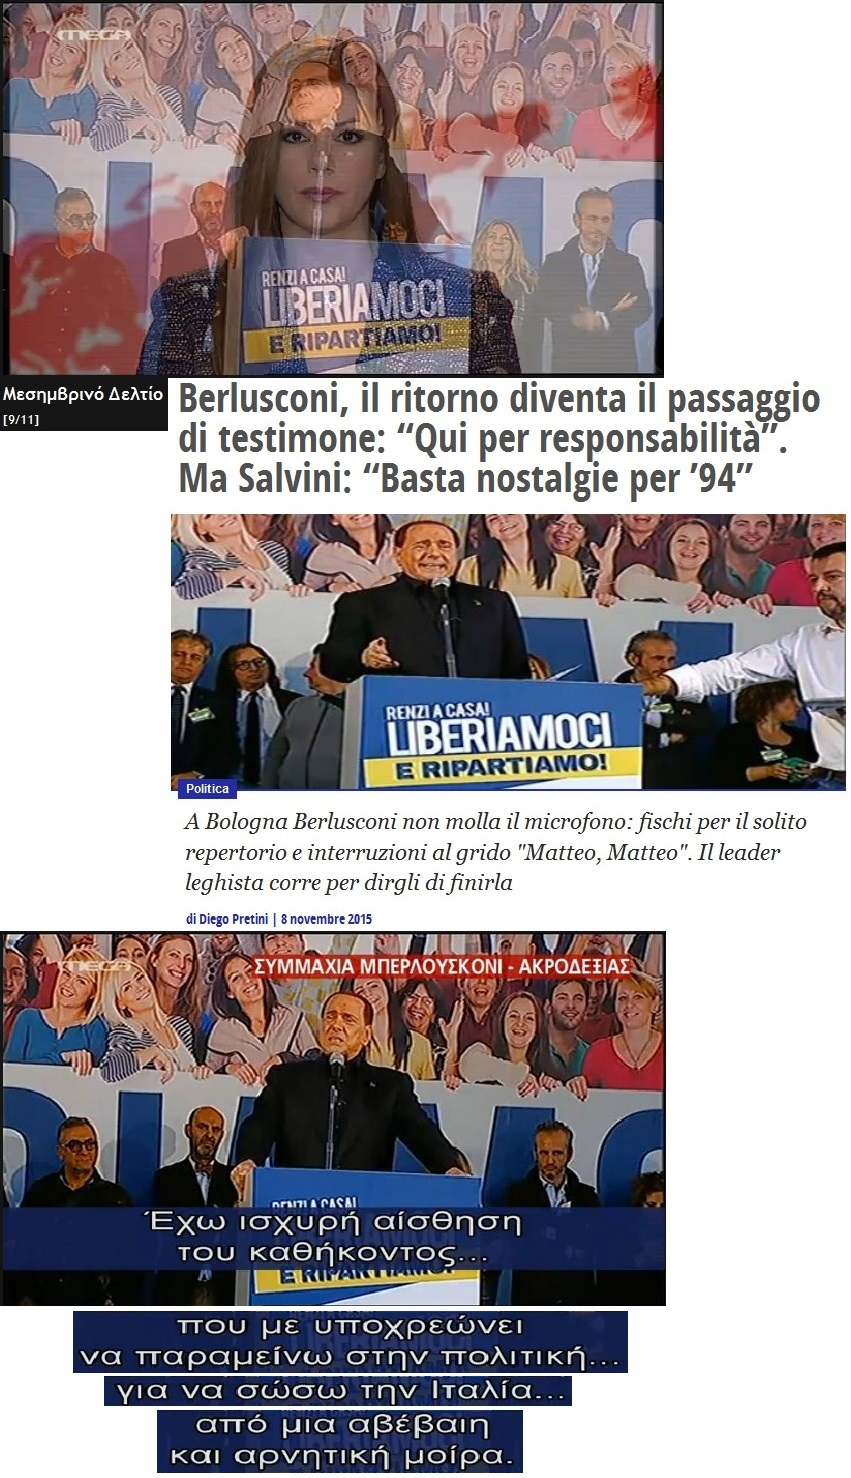 ITALY SILVIO BERLUSCONI 09 091115